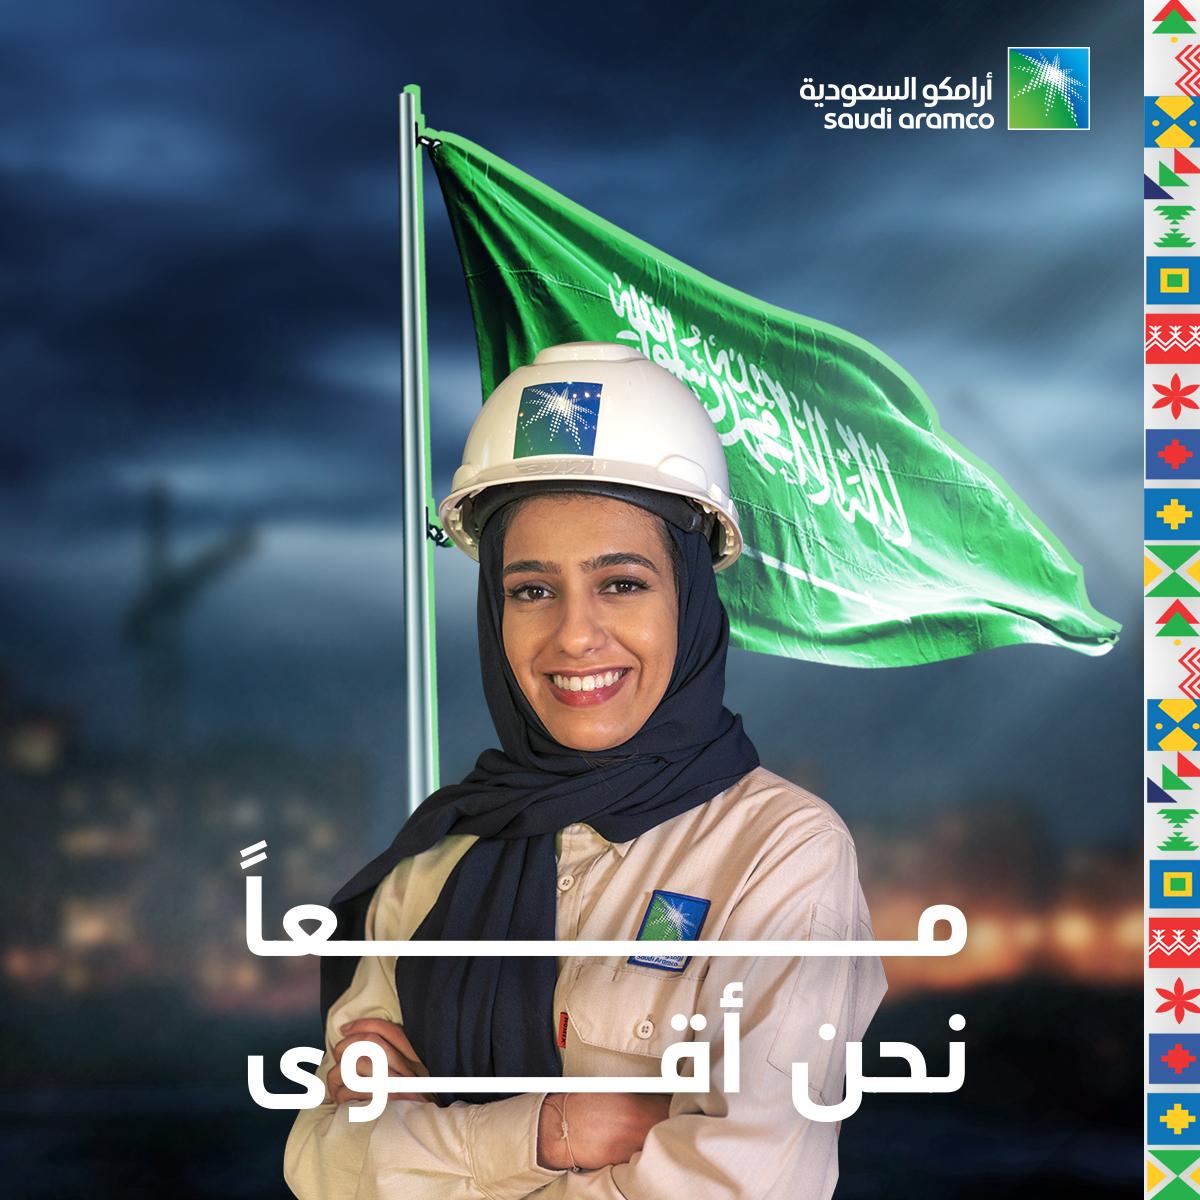 @SAFE_ROAD أسهم أبطال قطاع الطاقة والصناعة في تزويدنا بالطاقة، وسد احتياجاتنا الصناعية رغم التحديات. شكرًا لك على إظهار الامتنان لهم سعوديين #انسى_توقفنا https://t.co/Cduq0PUWrg